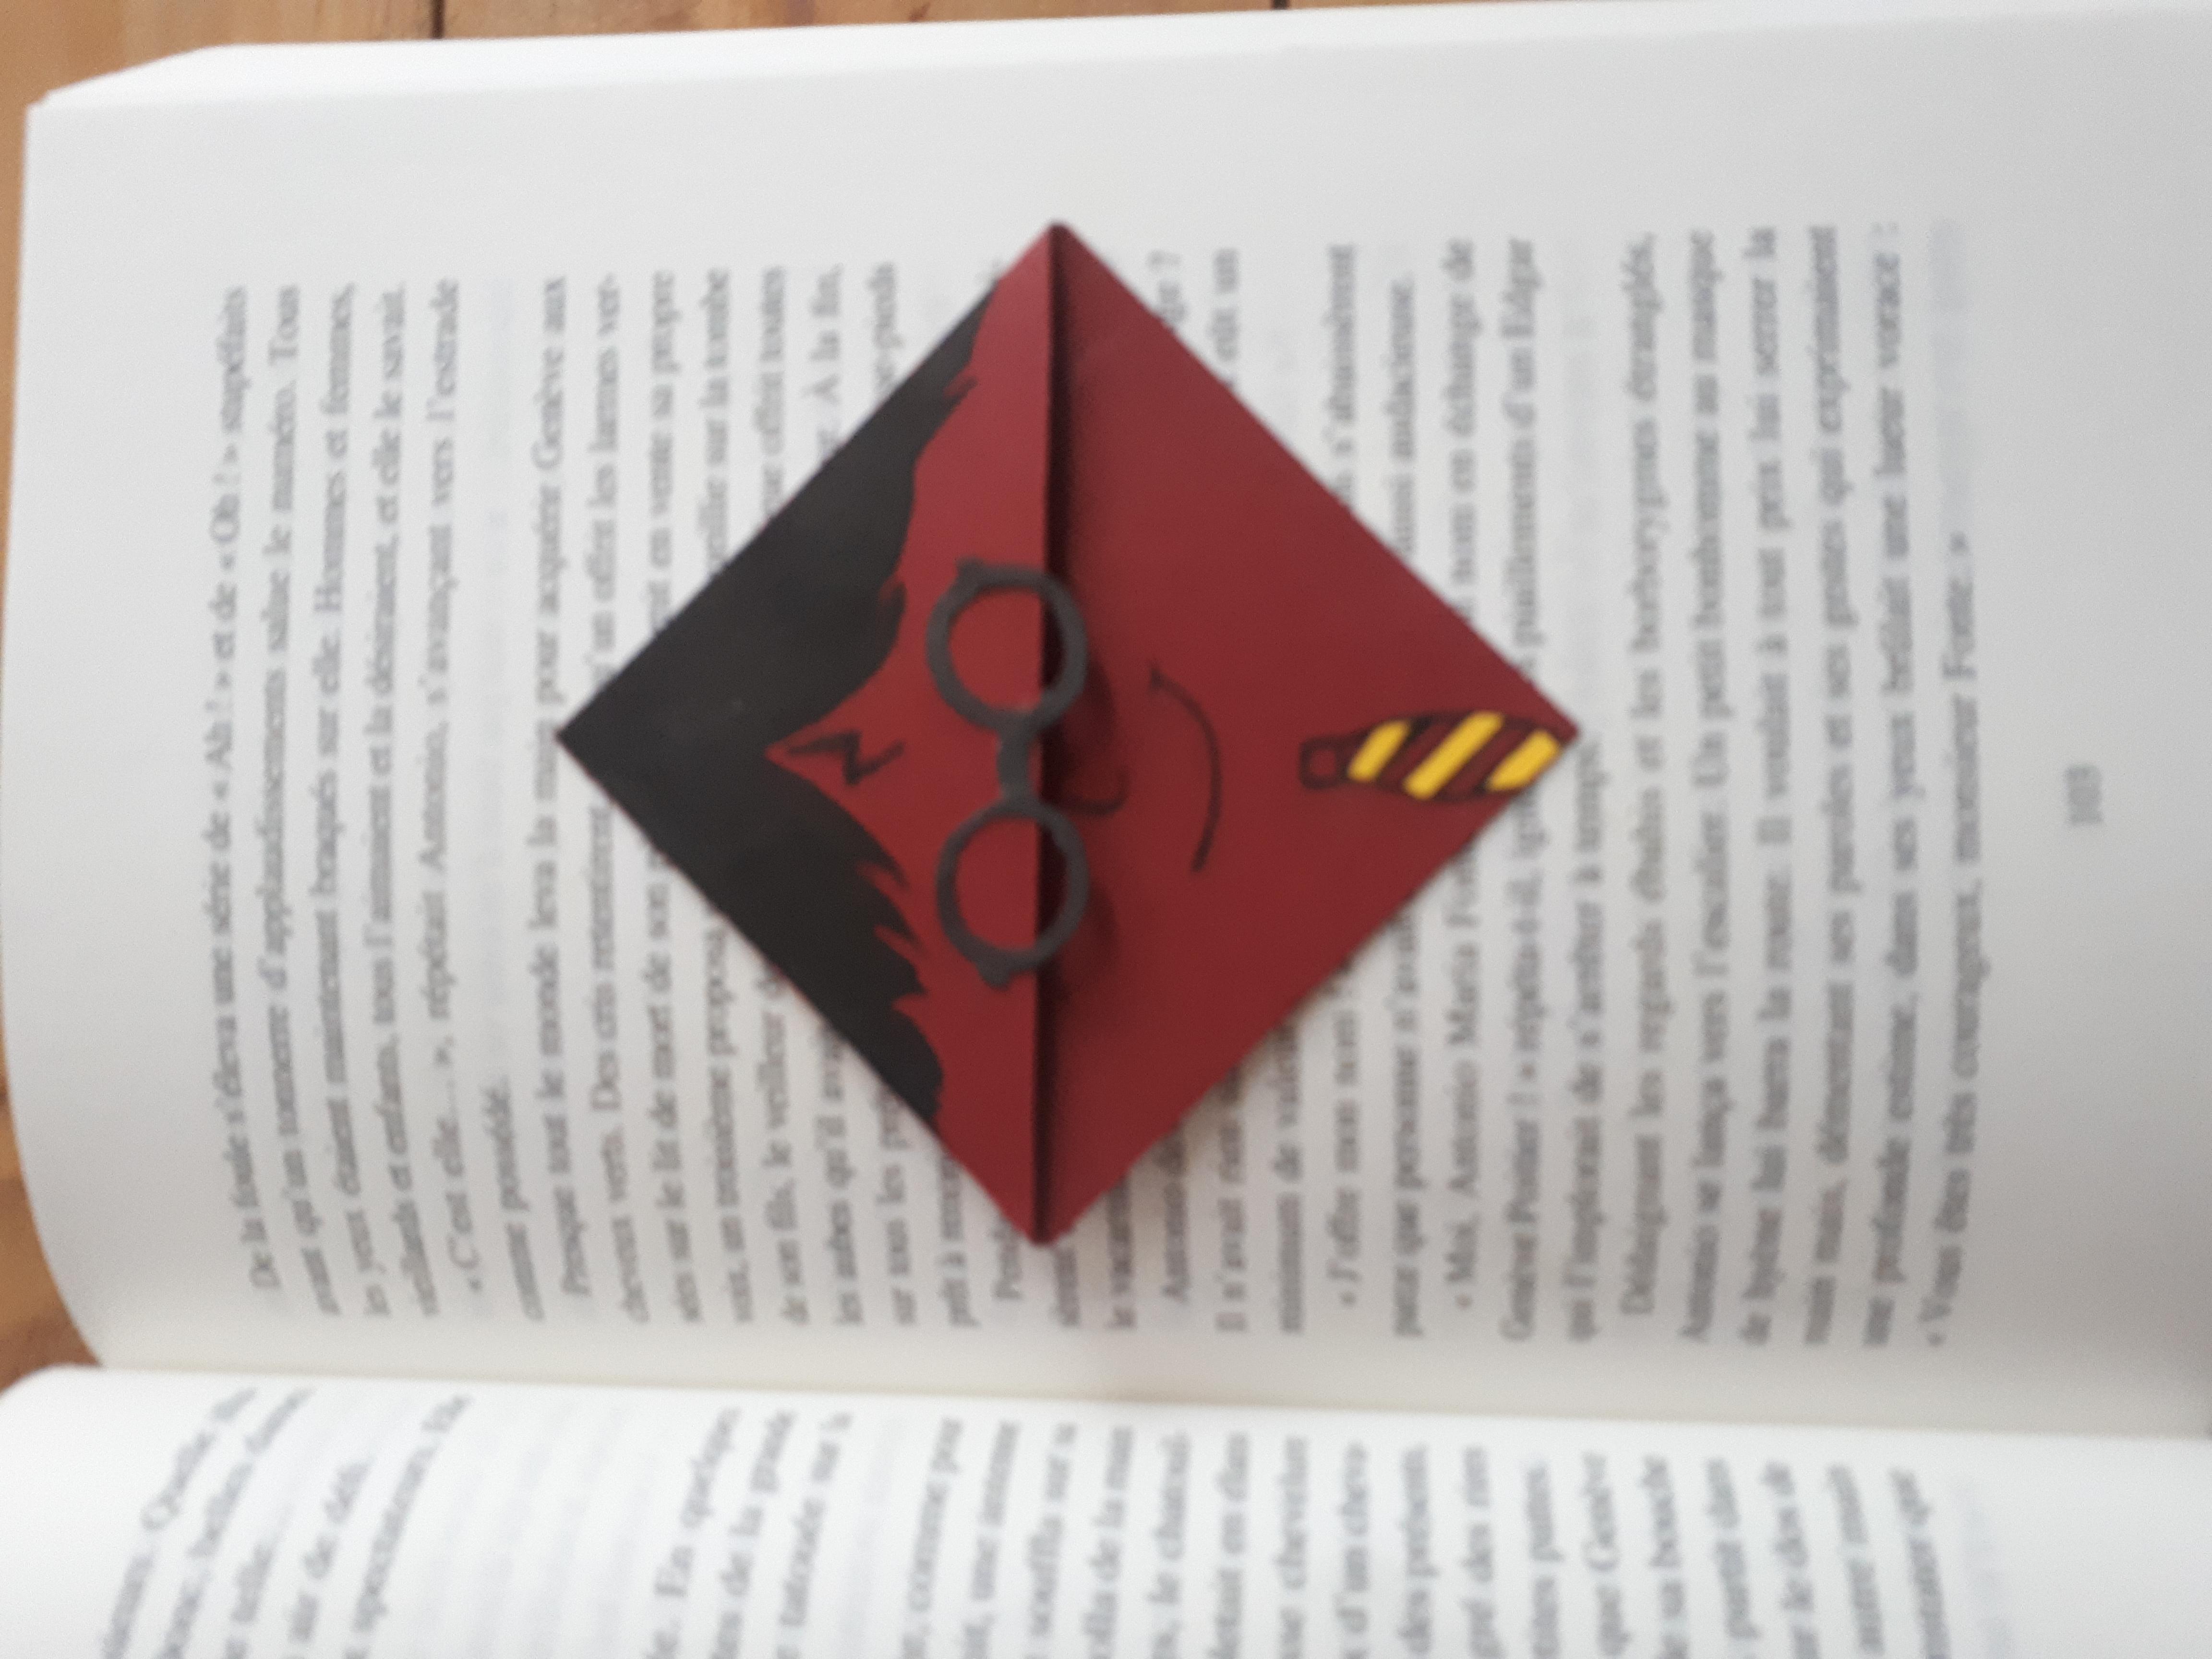 Harry Pages Marque Harry Pages Carré Potter Marque Carré oCrdxBe